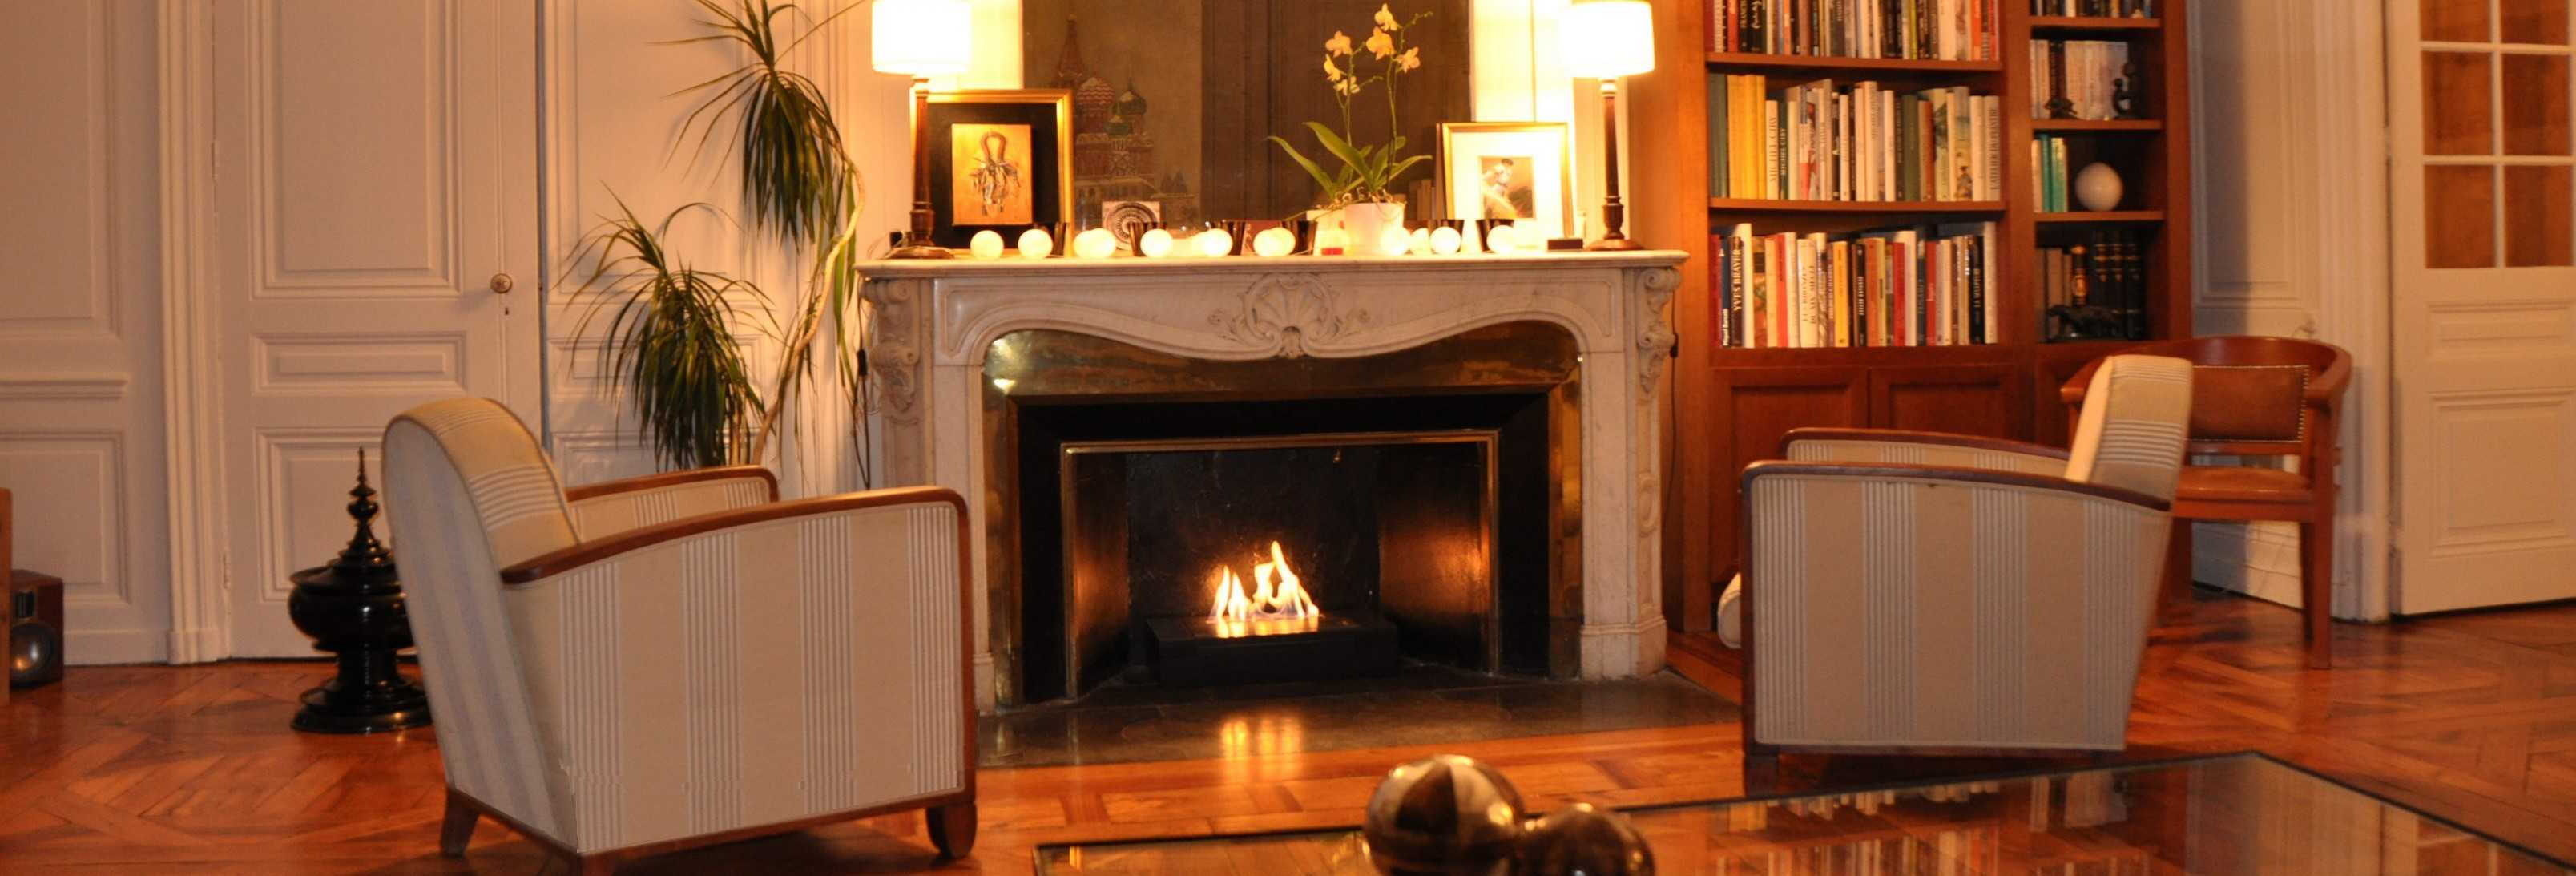 cheminee d 39 appartement ethanol. Black Bedroom Furniture Sets. Home Design Ideas